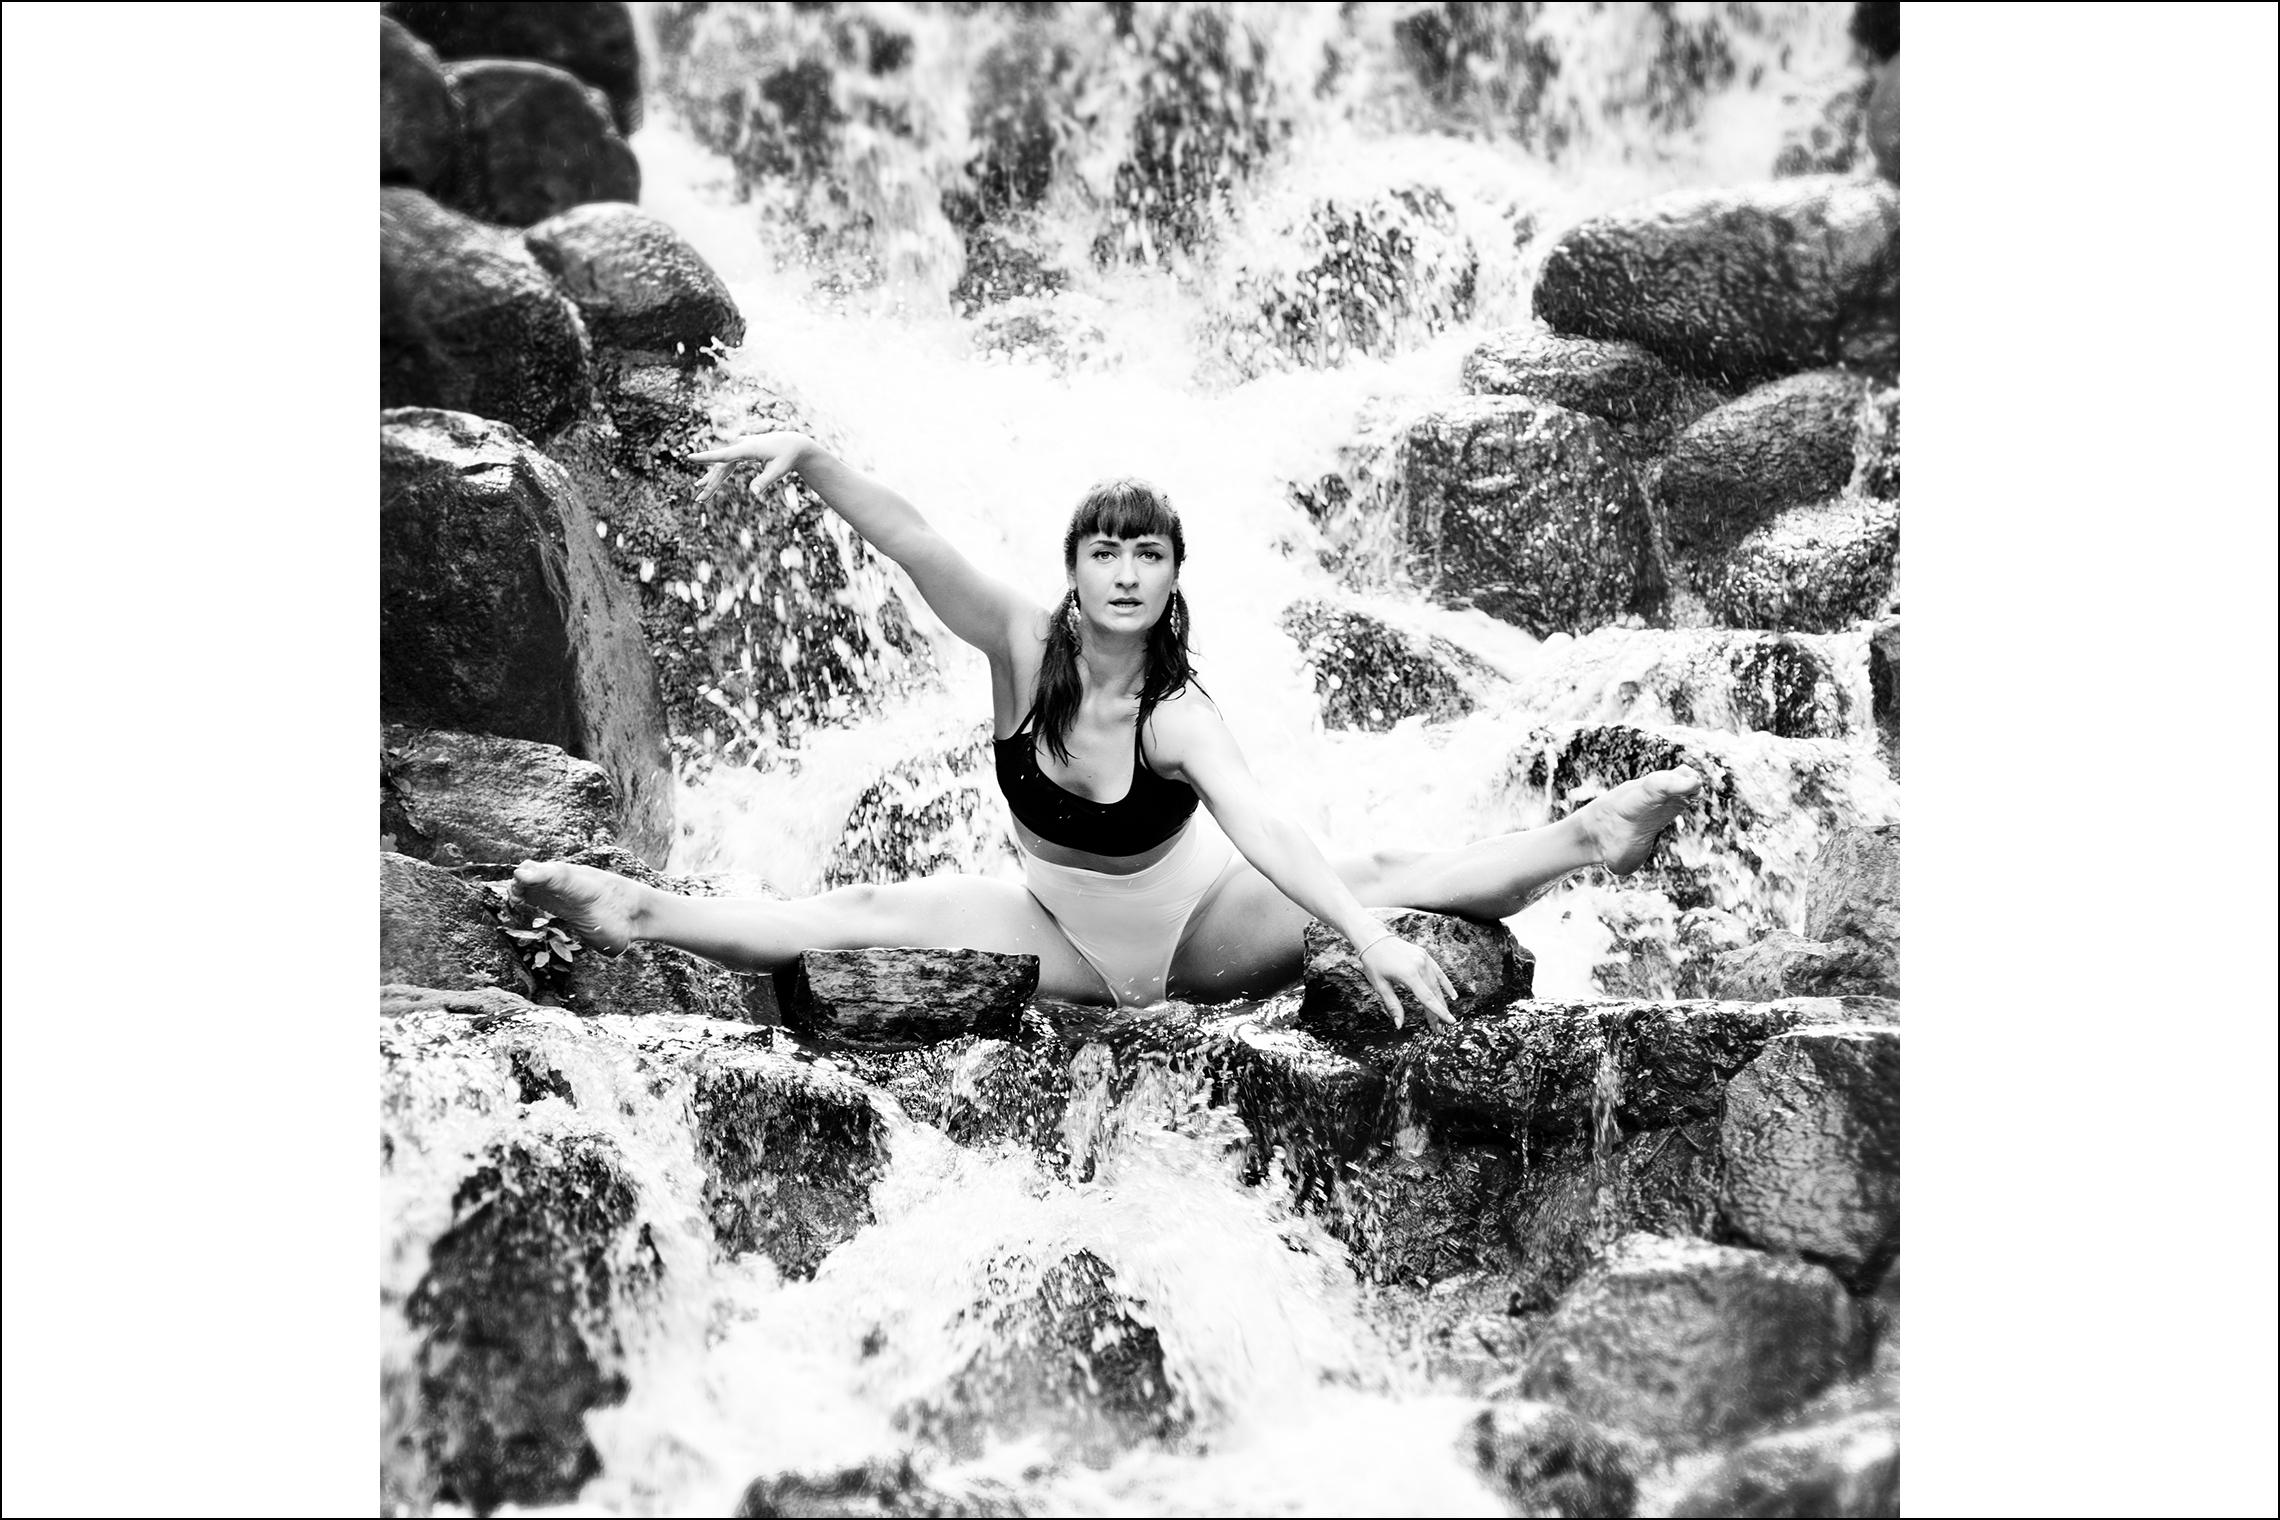 TänzerinnenFoto-FotoCaroHoene-Künstlerportrait-102